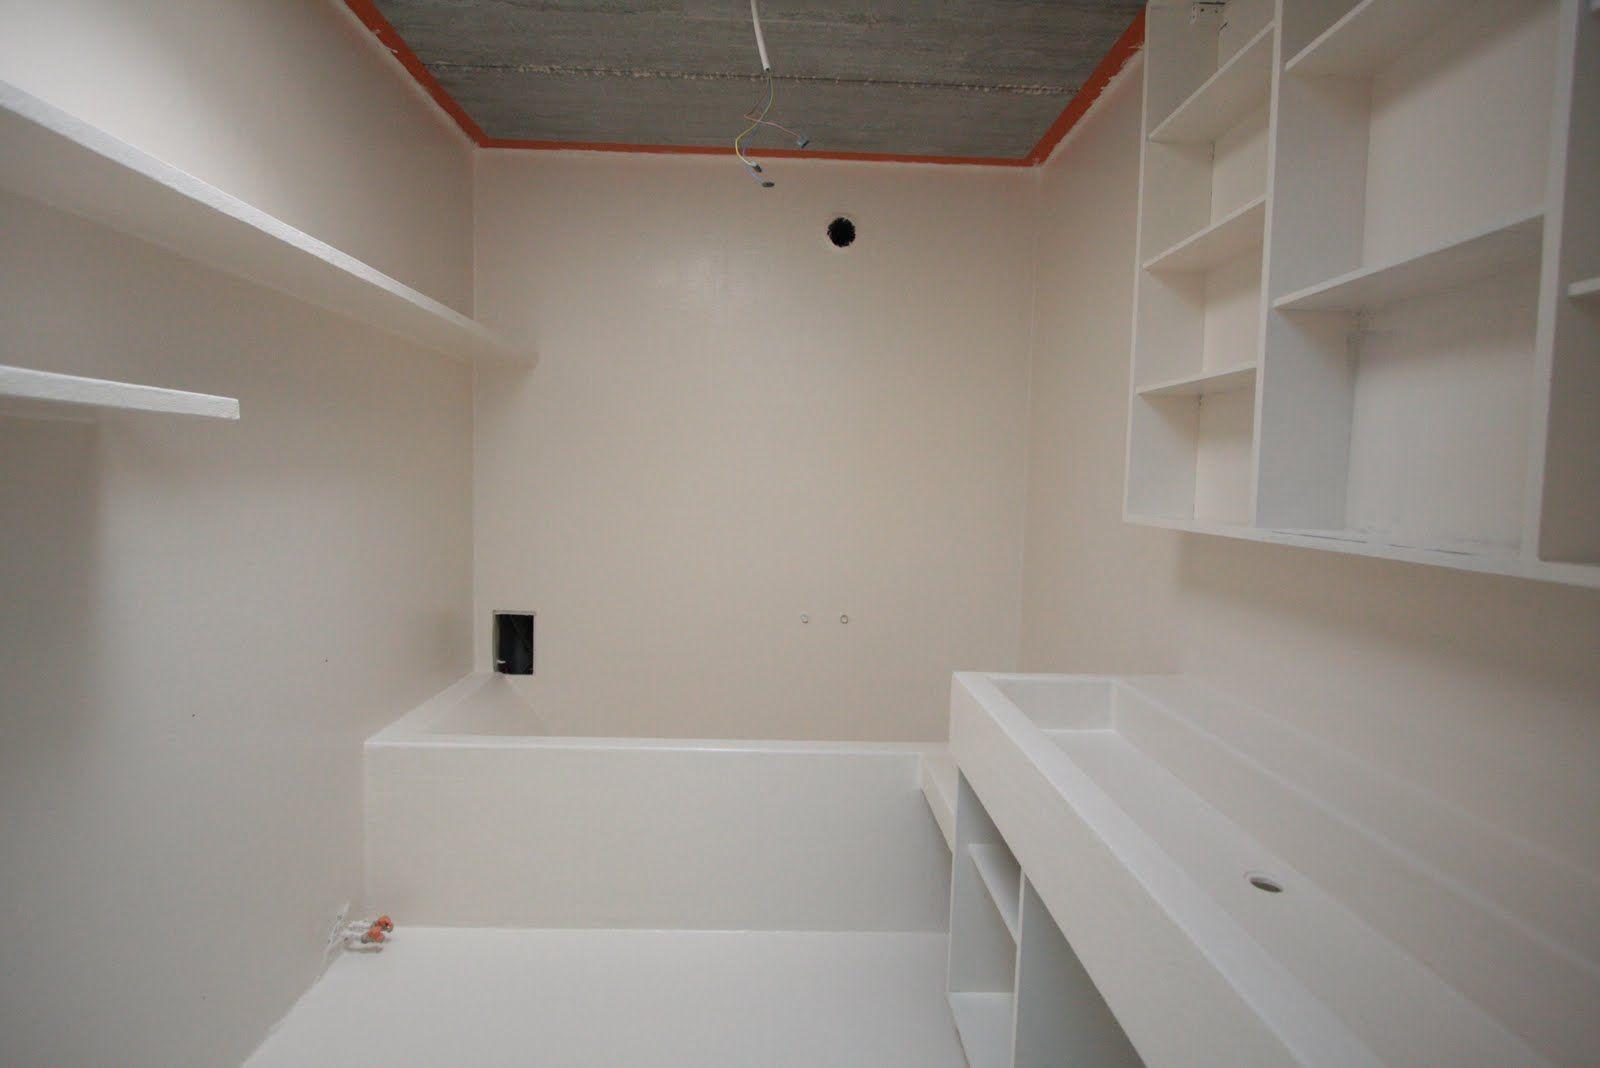 Polyester Badkamer Vloer : Polyester badkamer badkamer polyester pinterest badkamer